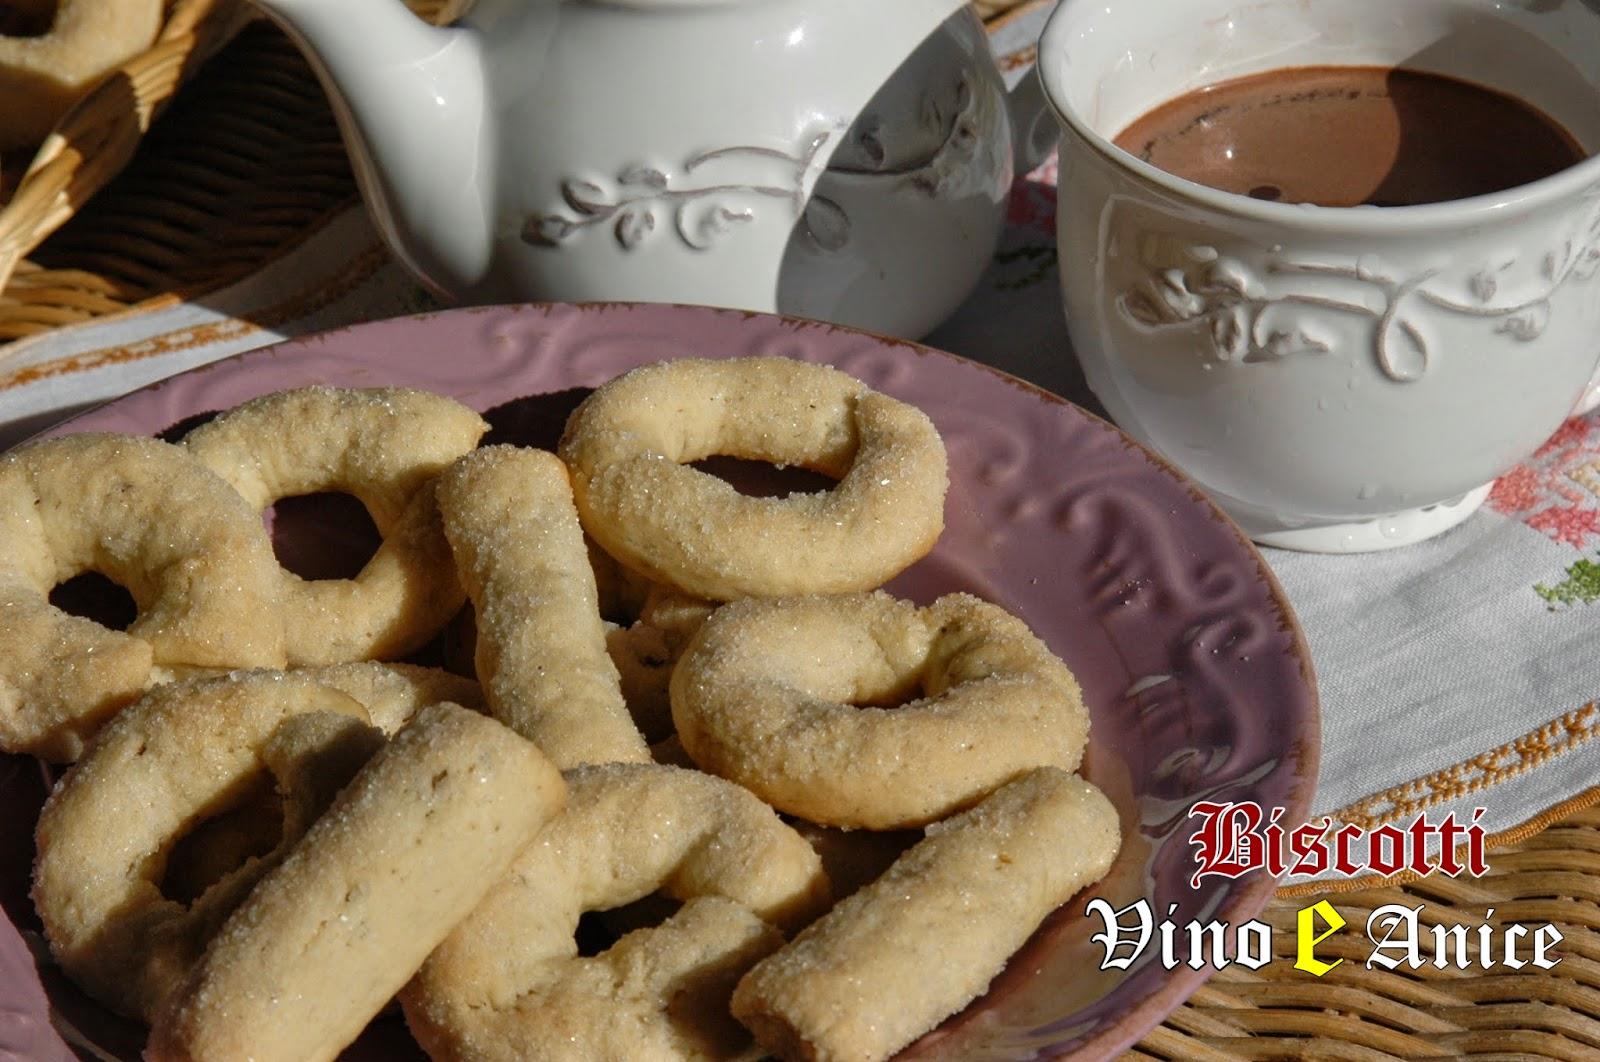 biscotti vino e anice